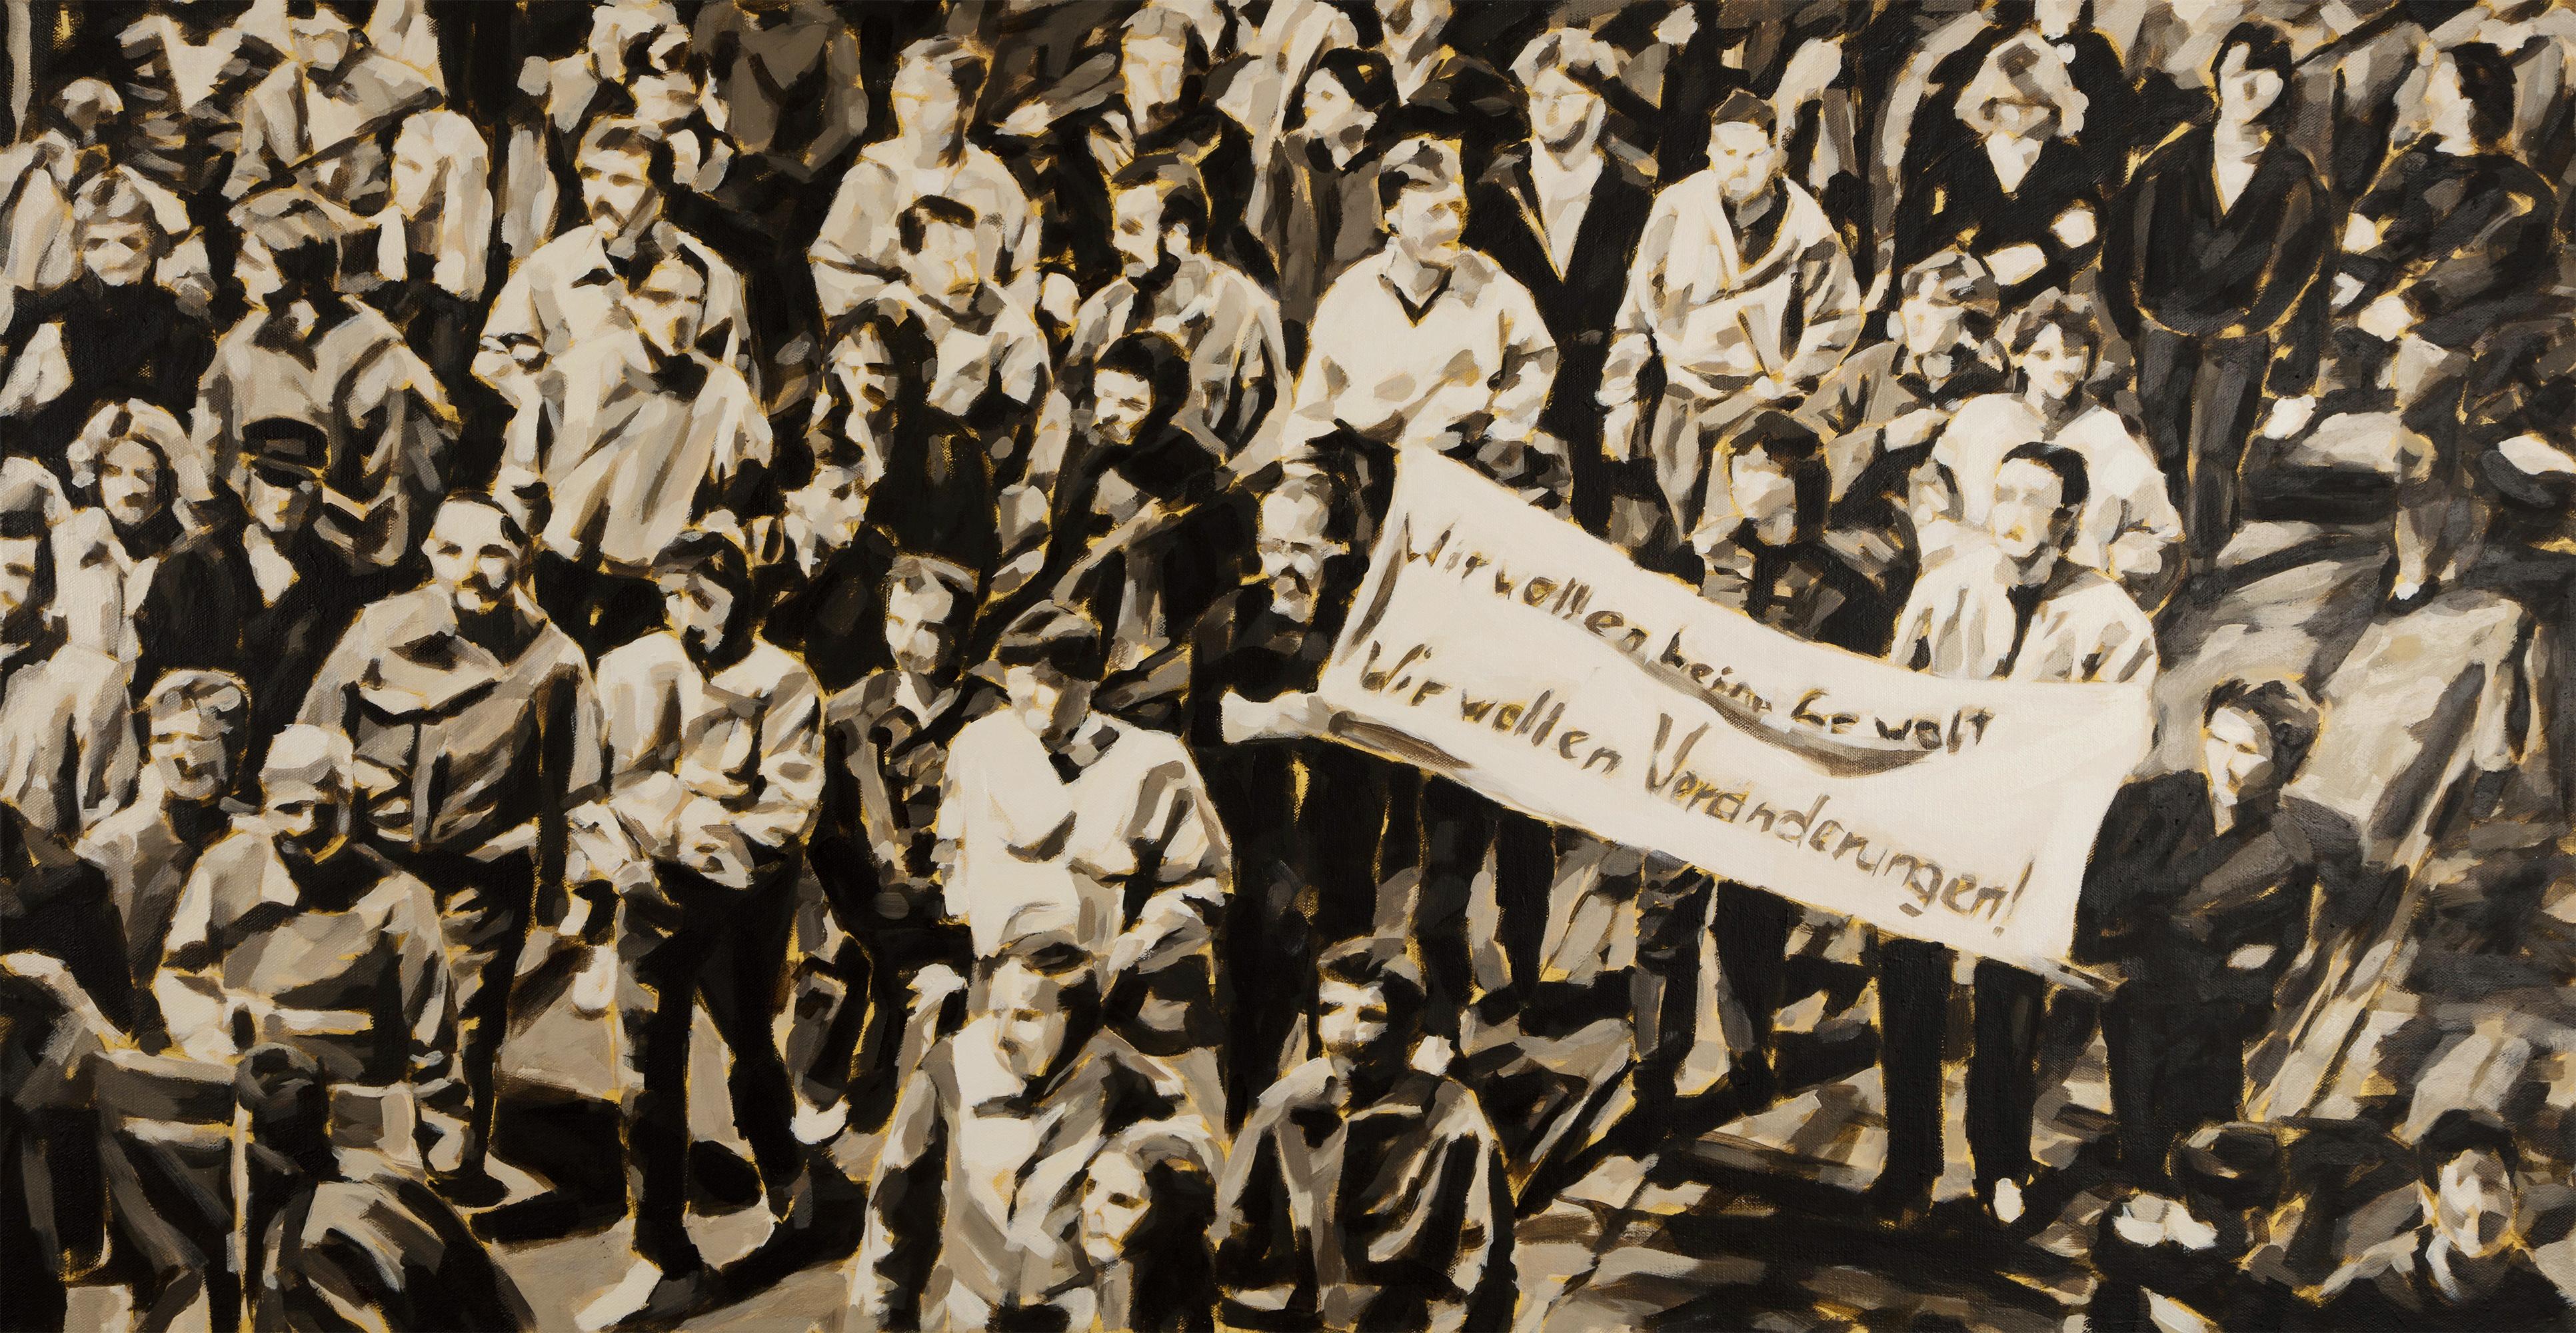 """Montagsdemonstration in Leipzig, 1989"", 75 x 150 cm, Öl auf Leinwand, 2015"